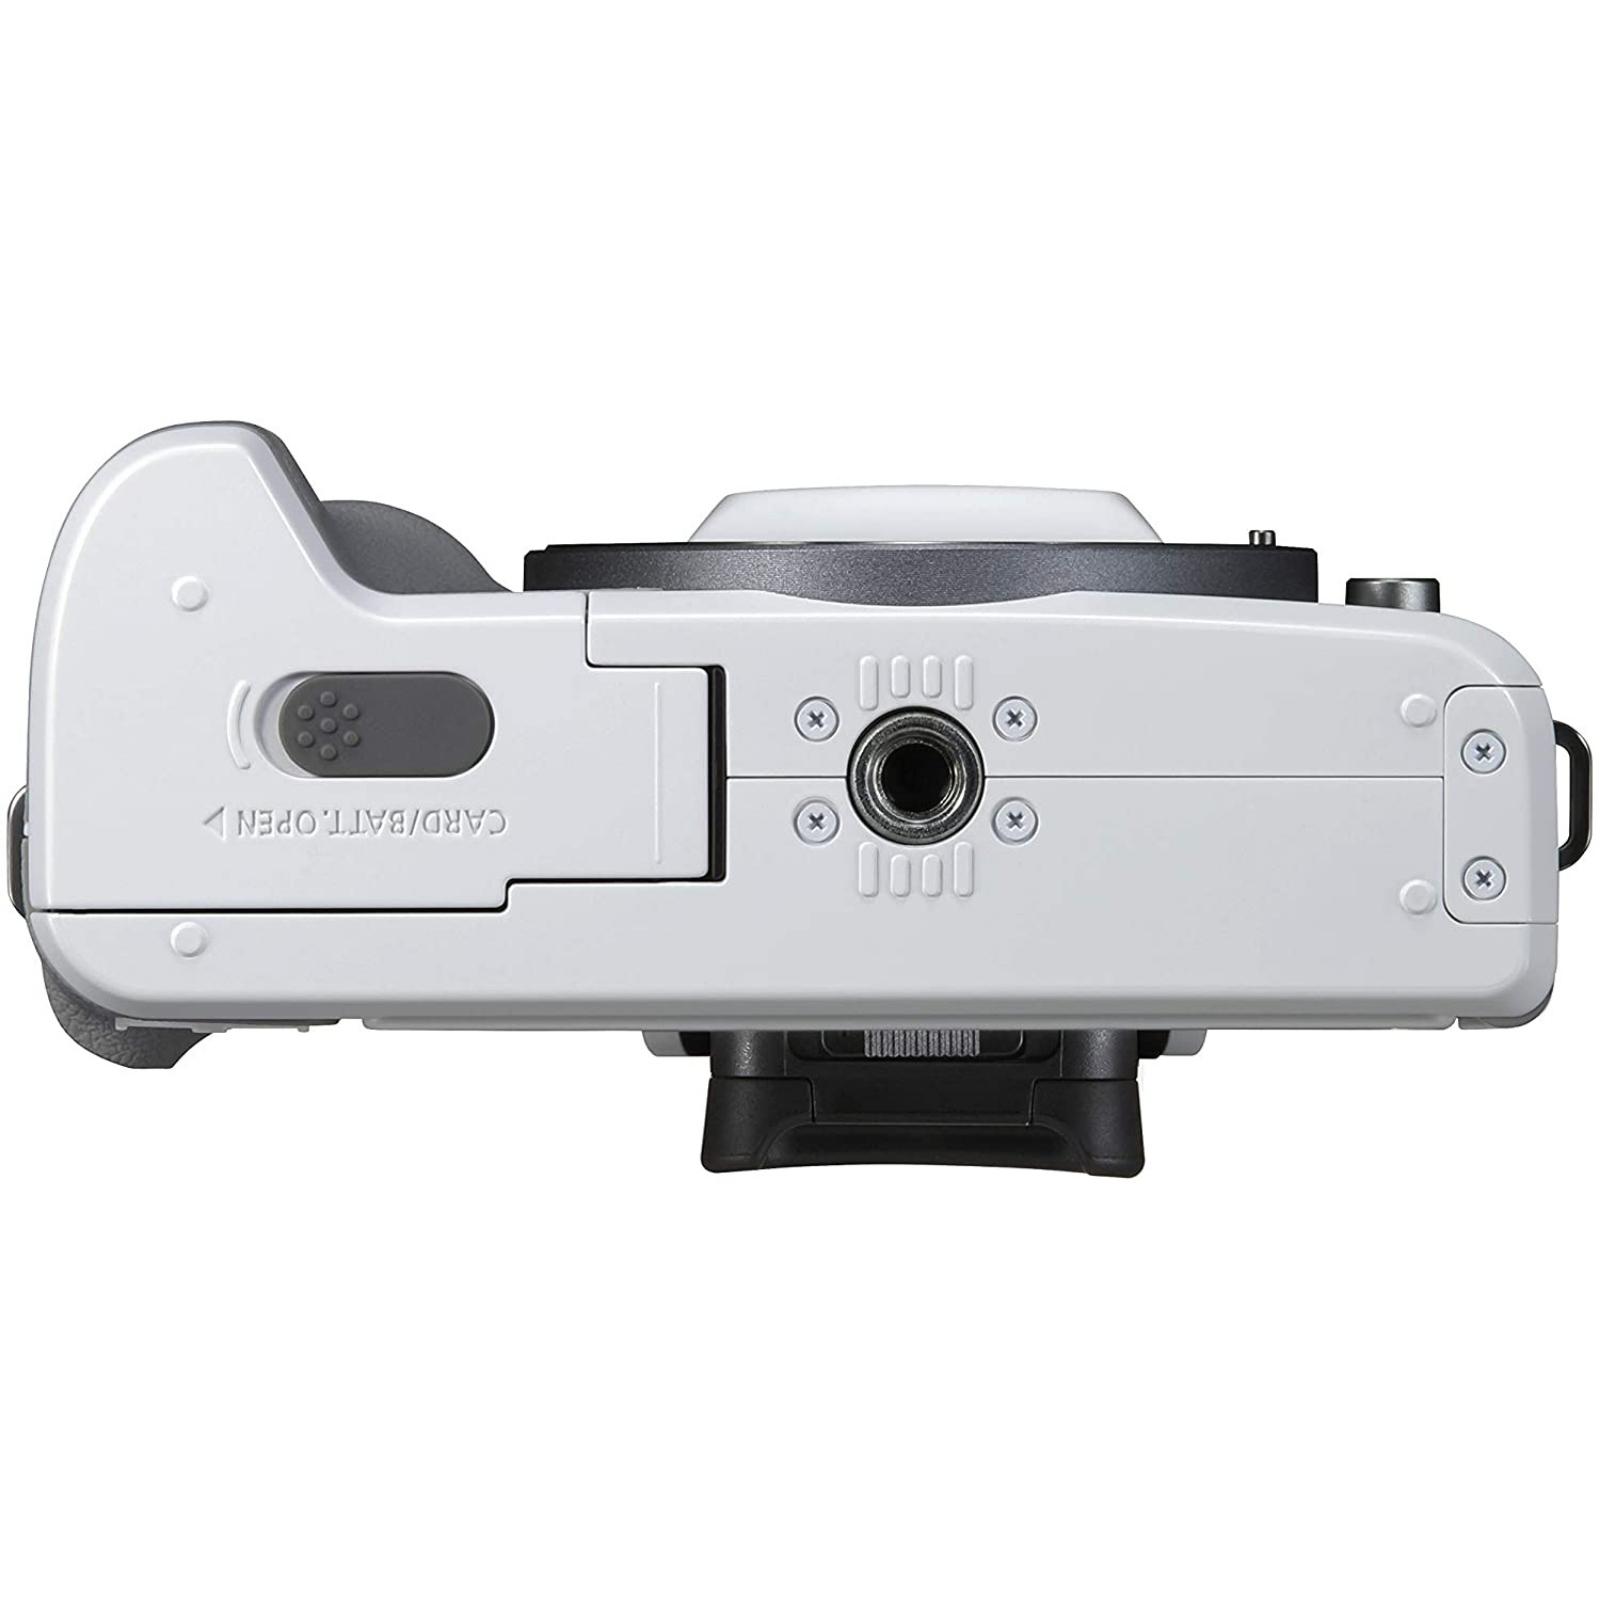 Canon キヤノン ミラーレス一眼カメラ EOS Kiss M2 ボディー ホワイト 新品